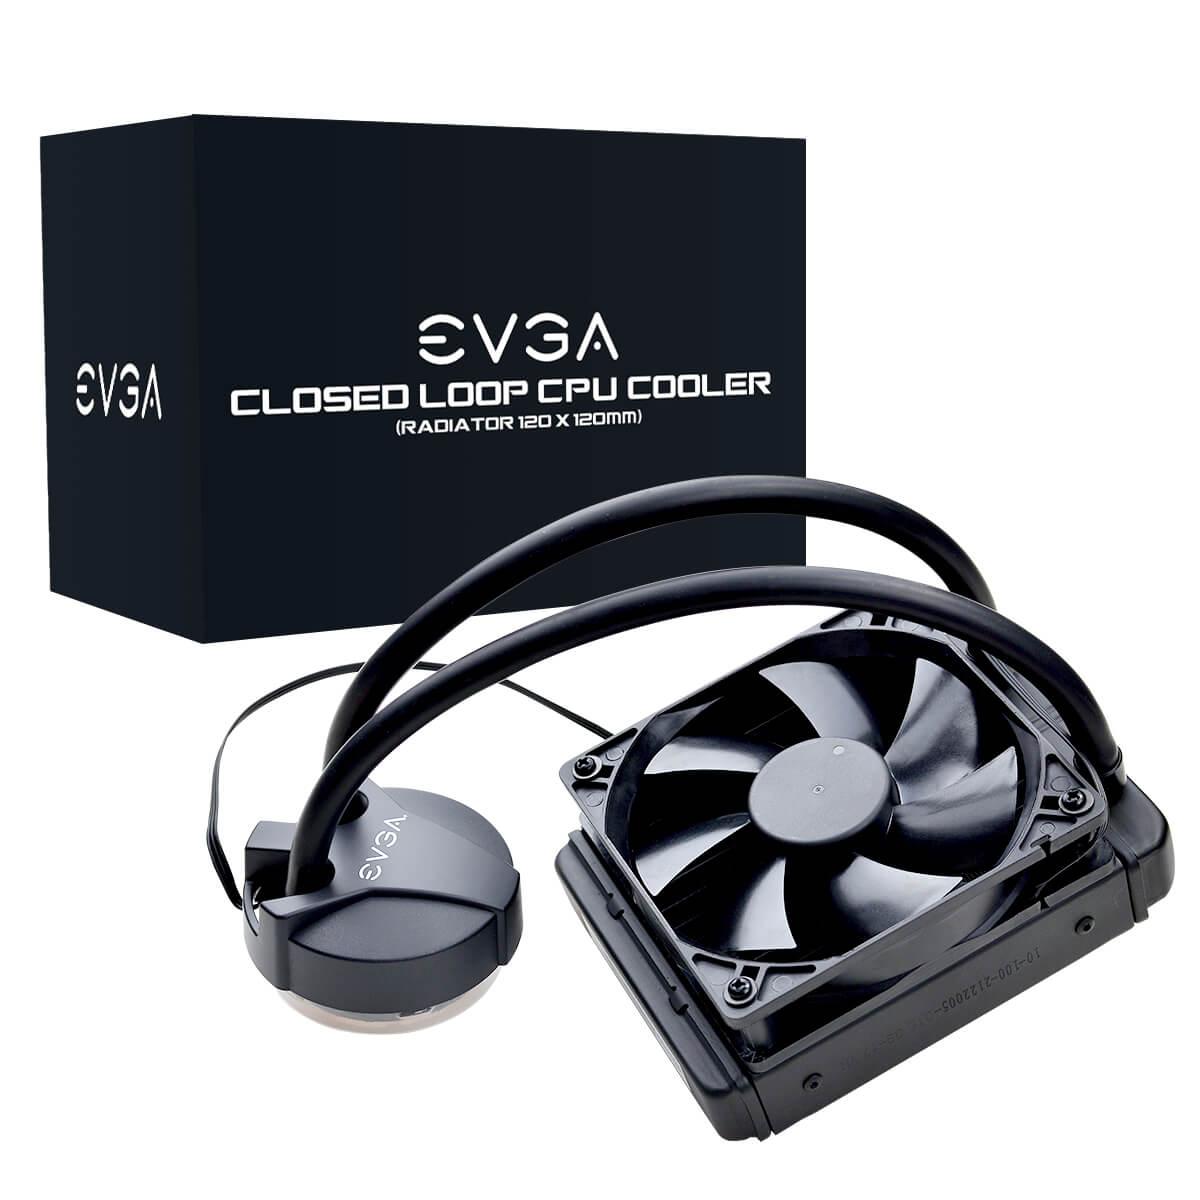 Cooler CPU EVGA CLC 120 CL11 LIQUID